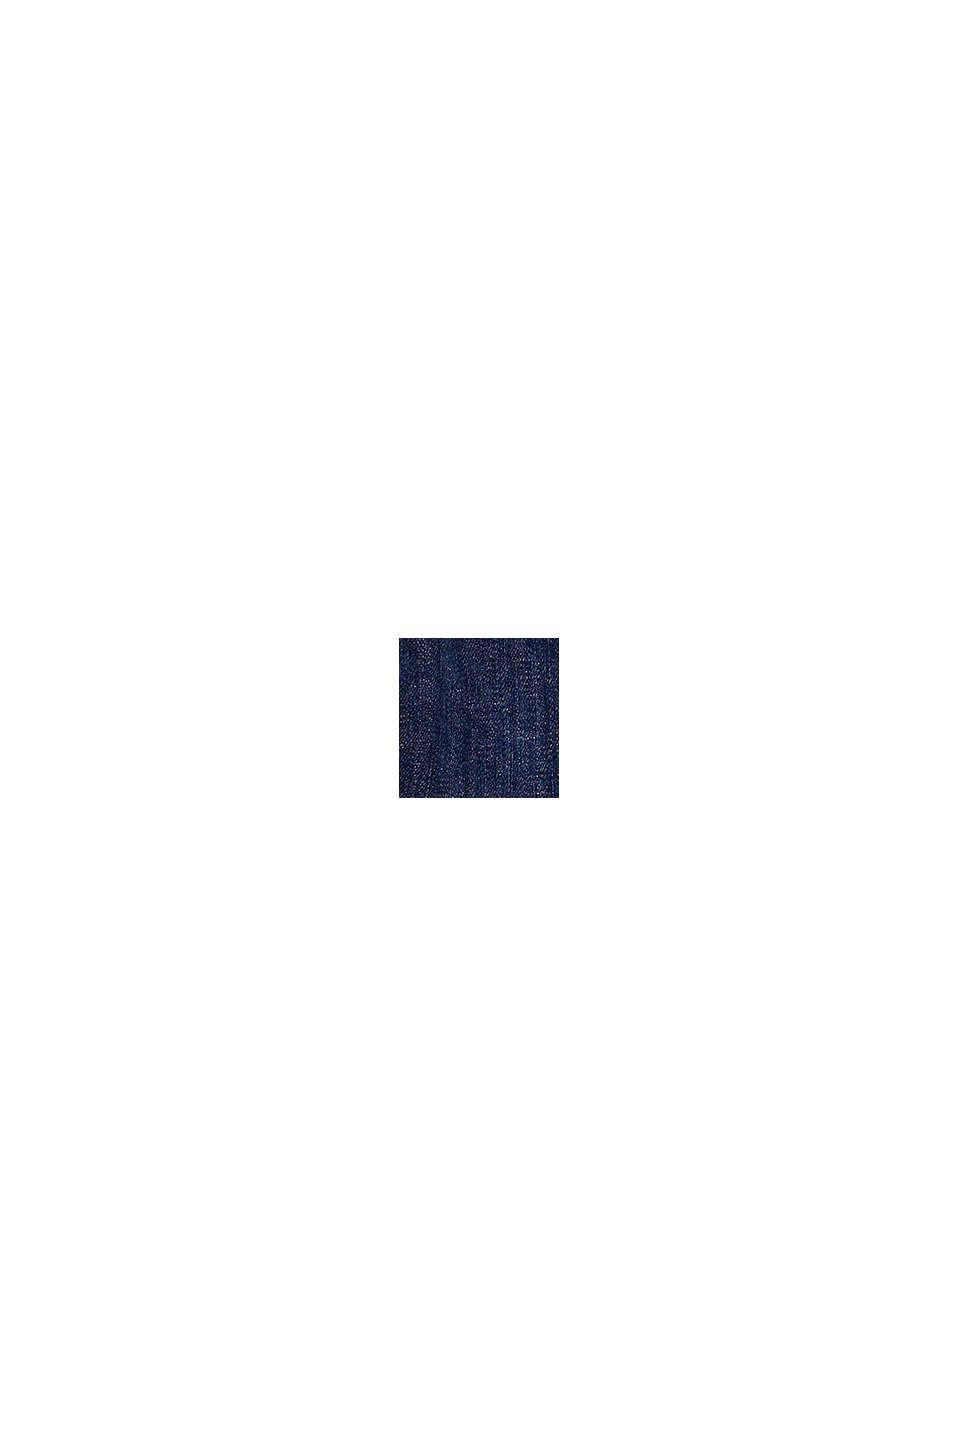 Jean à poches plaquées et taille ajustable, BLUE DARK WASHED, swatch